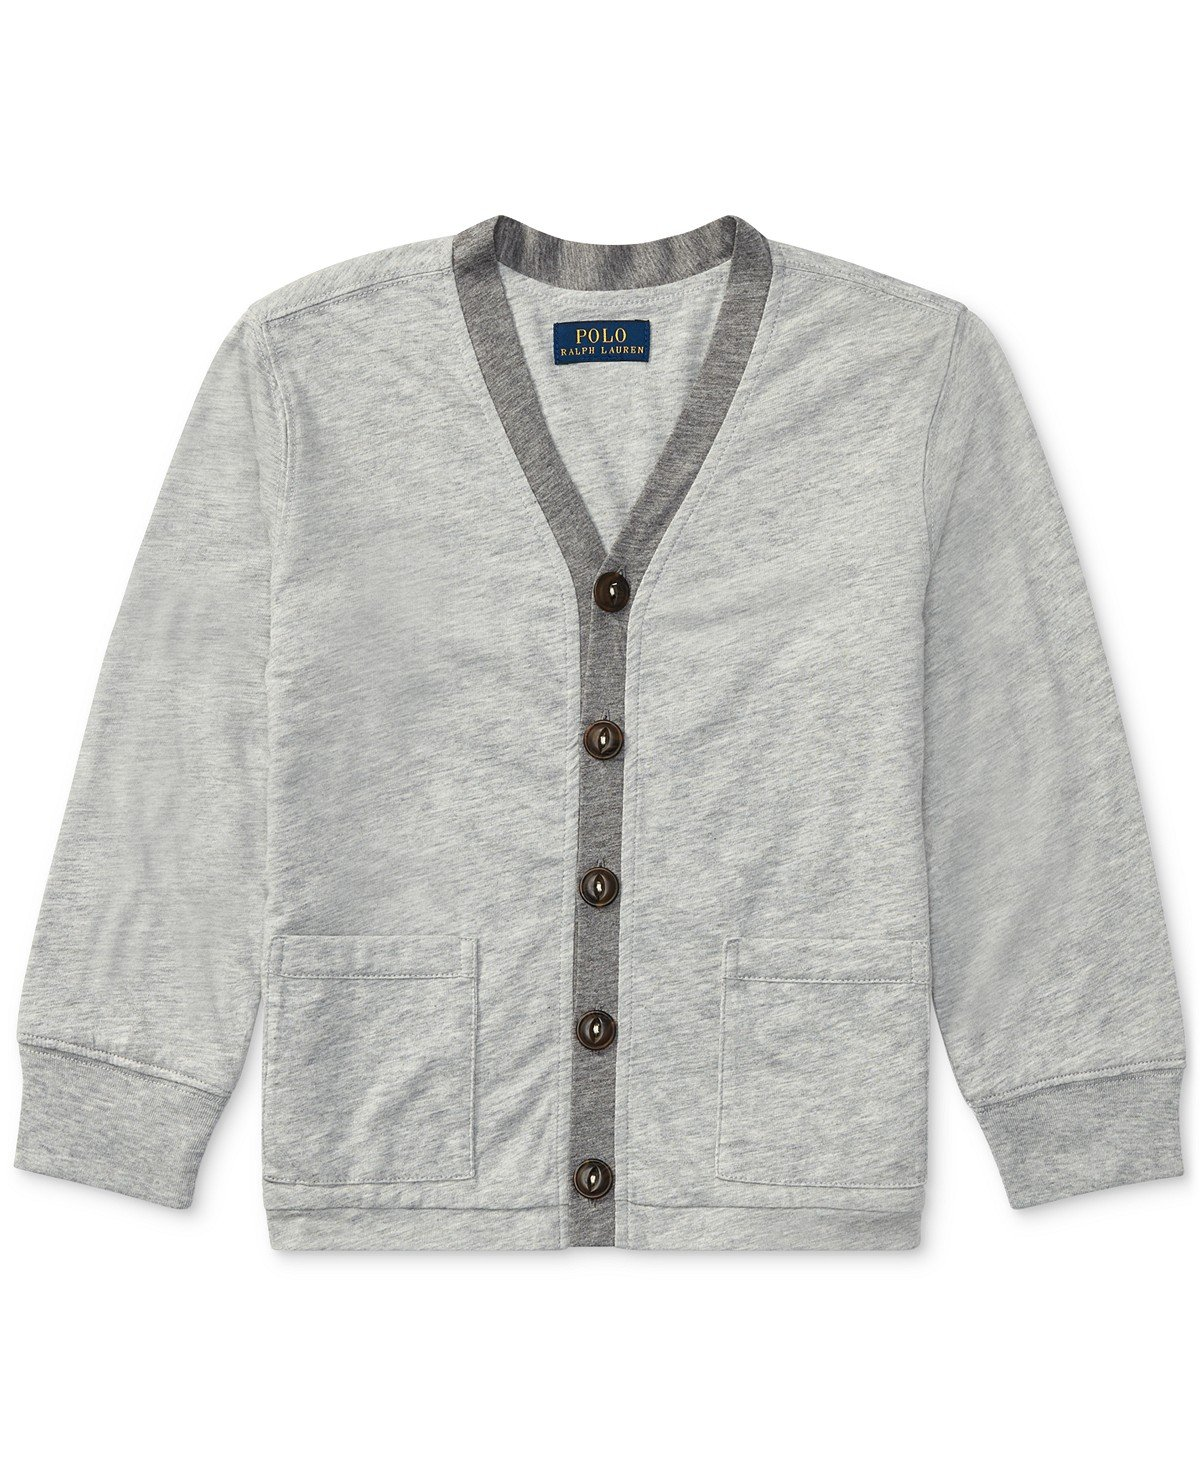 Polo Ralph Lauren Boys' 2T-20 Jersey Cardigan Knit Top (Medium 10-12)